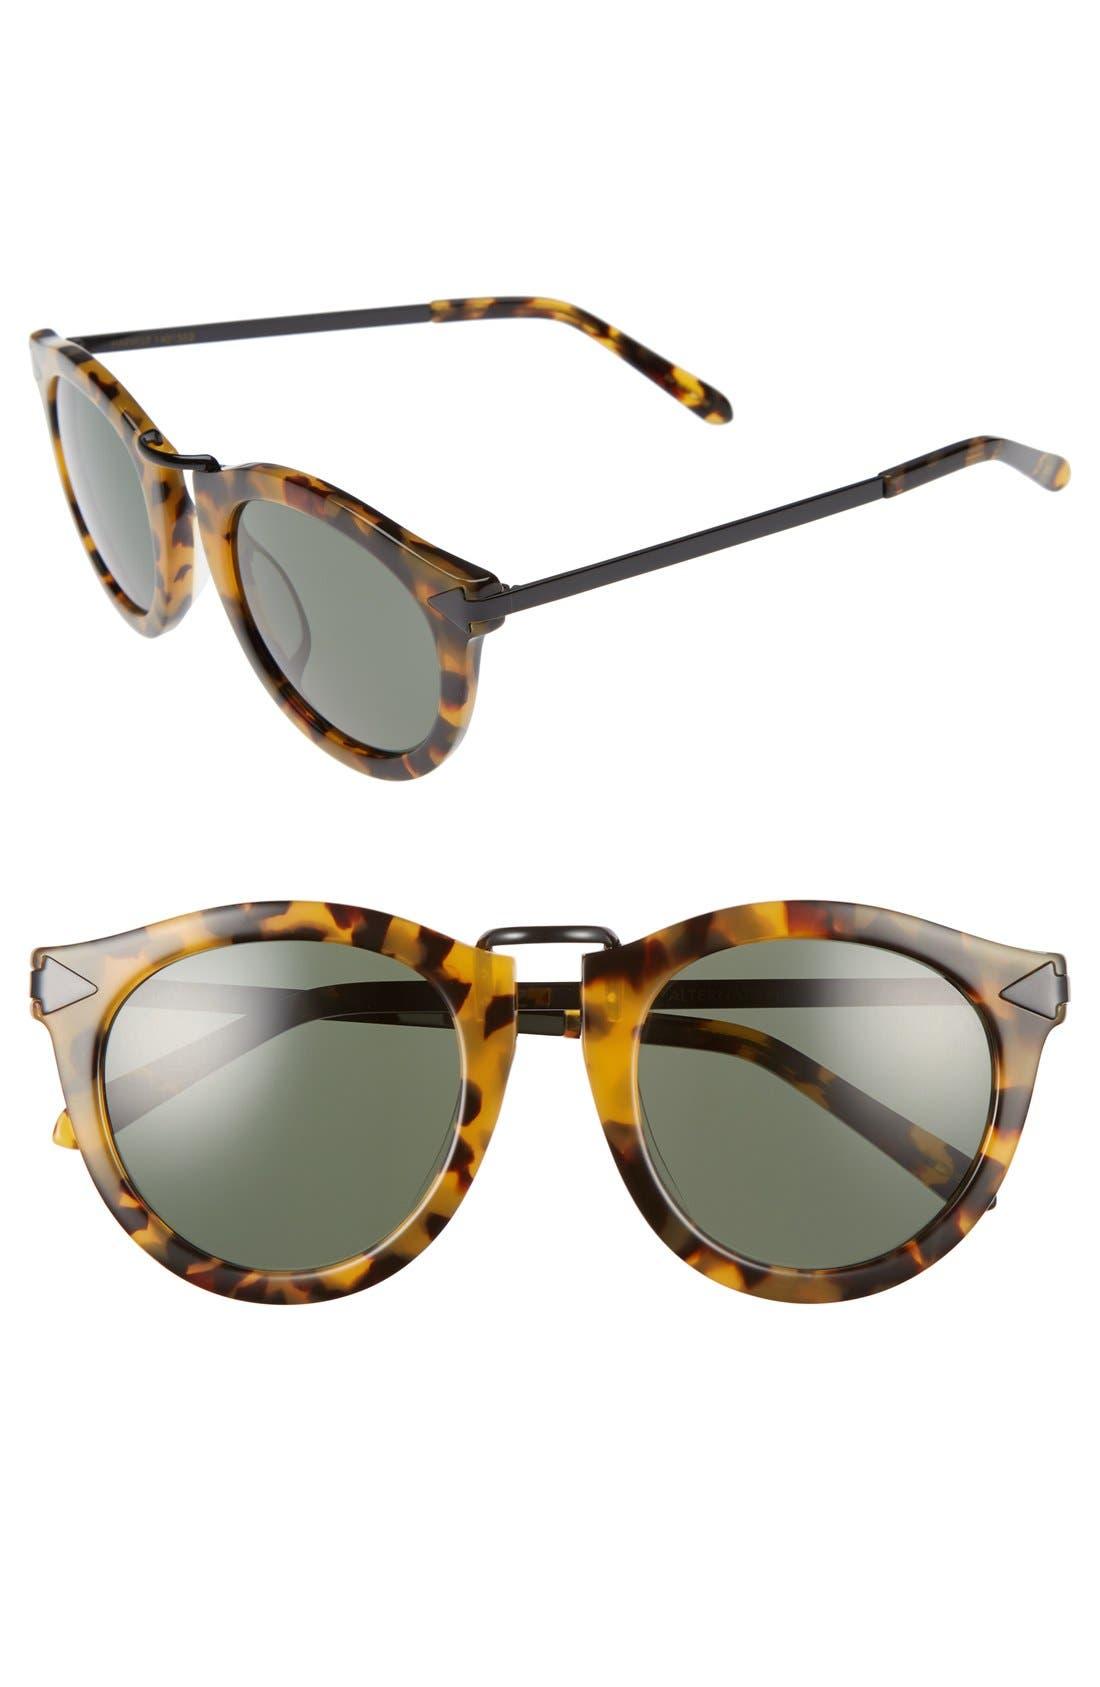 Alternate Image 1 Selected - Karen Walker Alternative Fit Harvest 59mm Retro Sunglasses